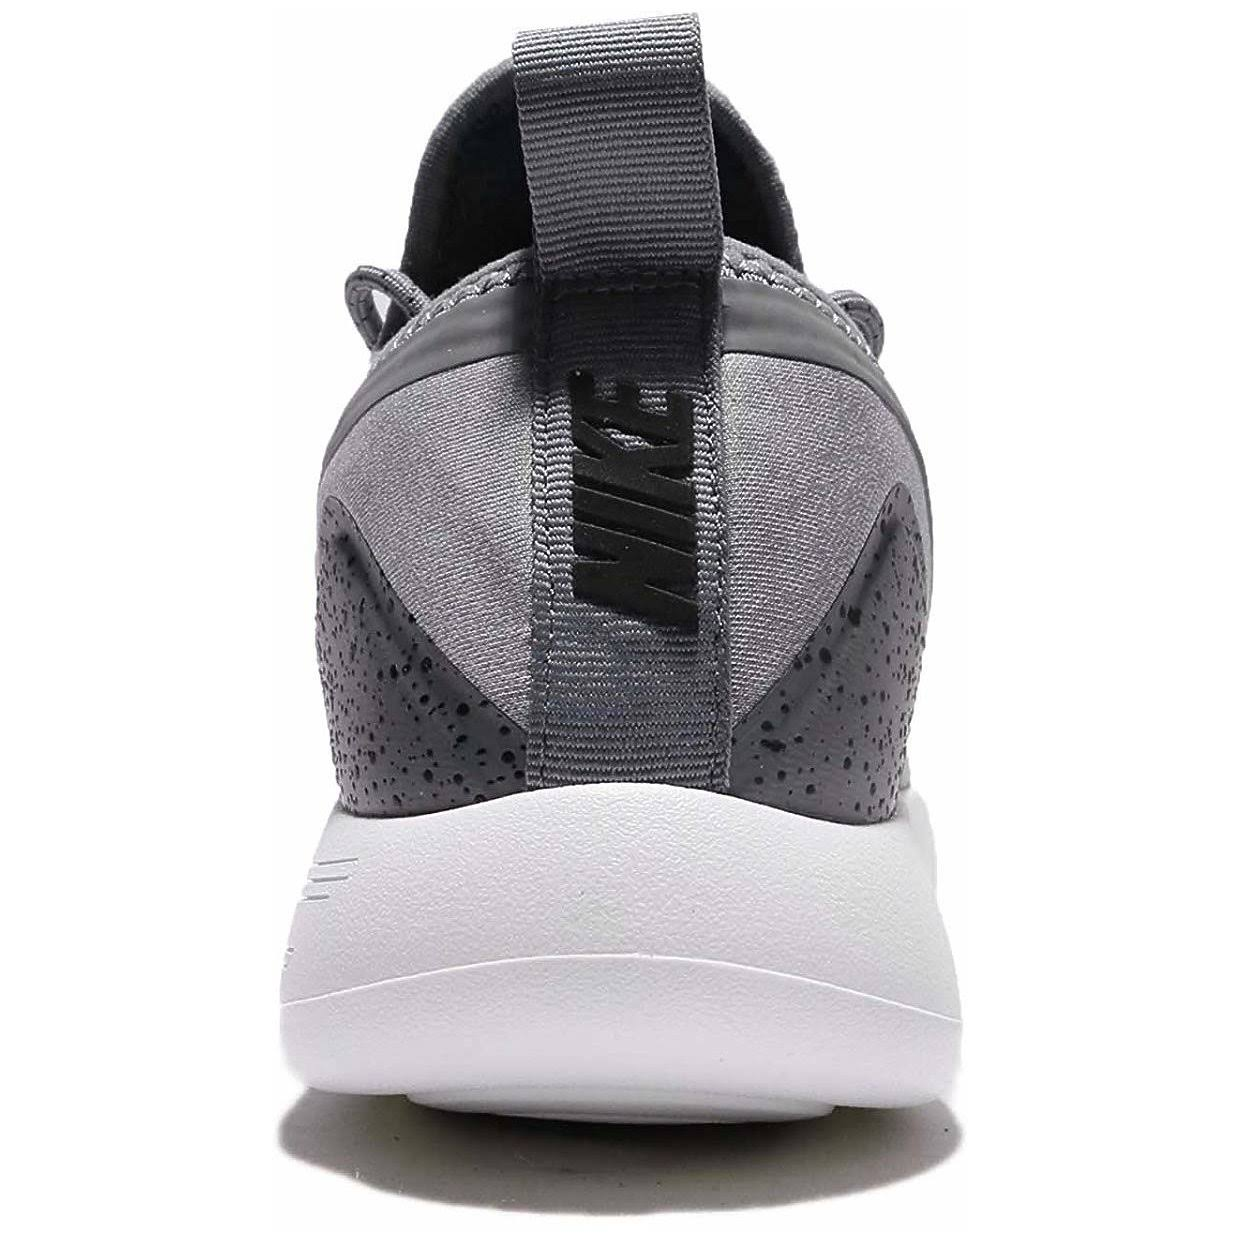 Damen Essential Black Grey Laufschuhe Cool Nike 002 Lunarcharge ZEqP8P